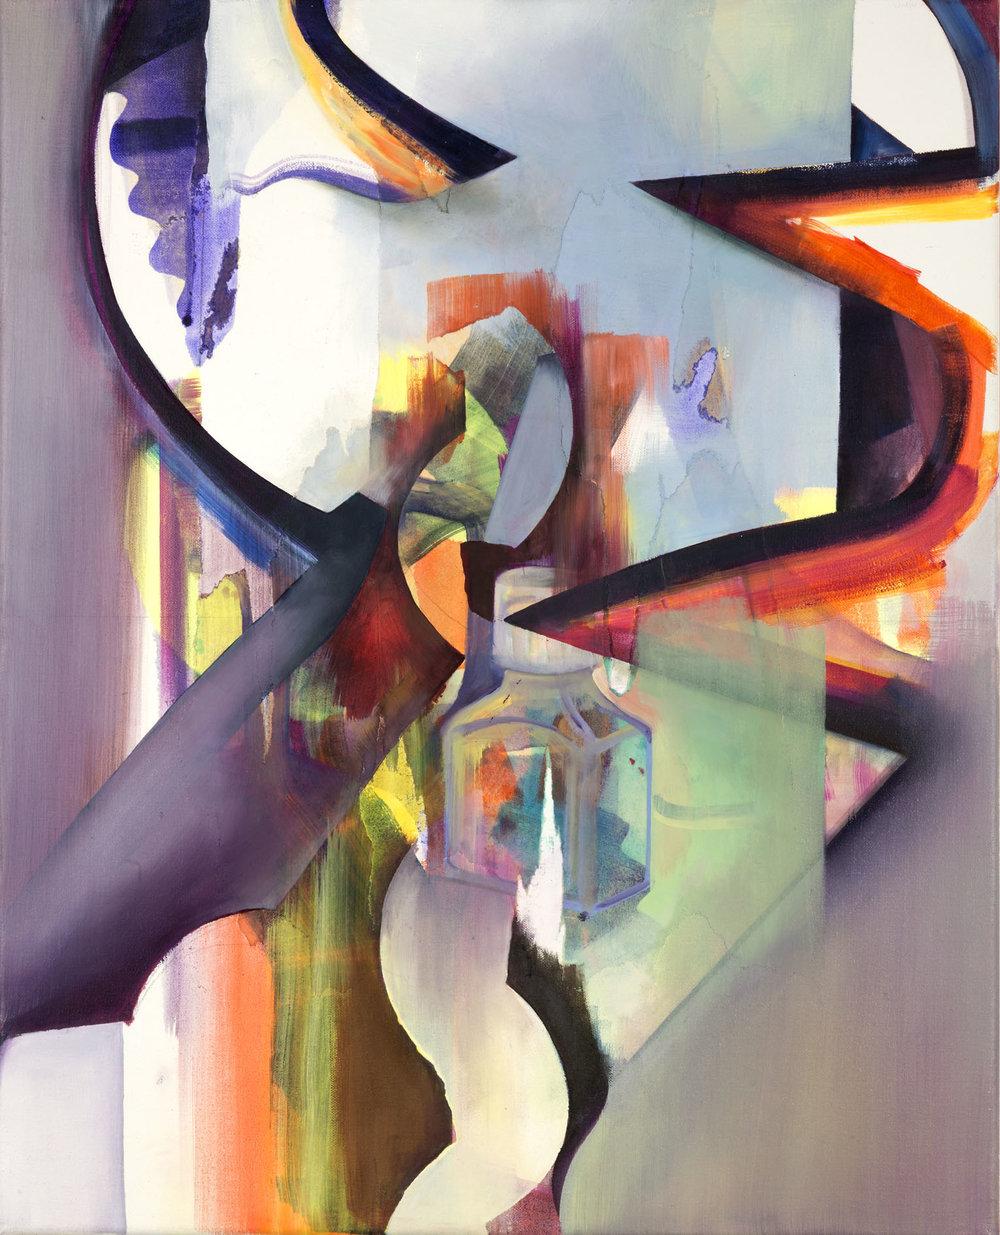 Untitled 19, oil on linen, 50cm x 40cm, 2018